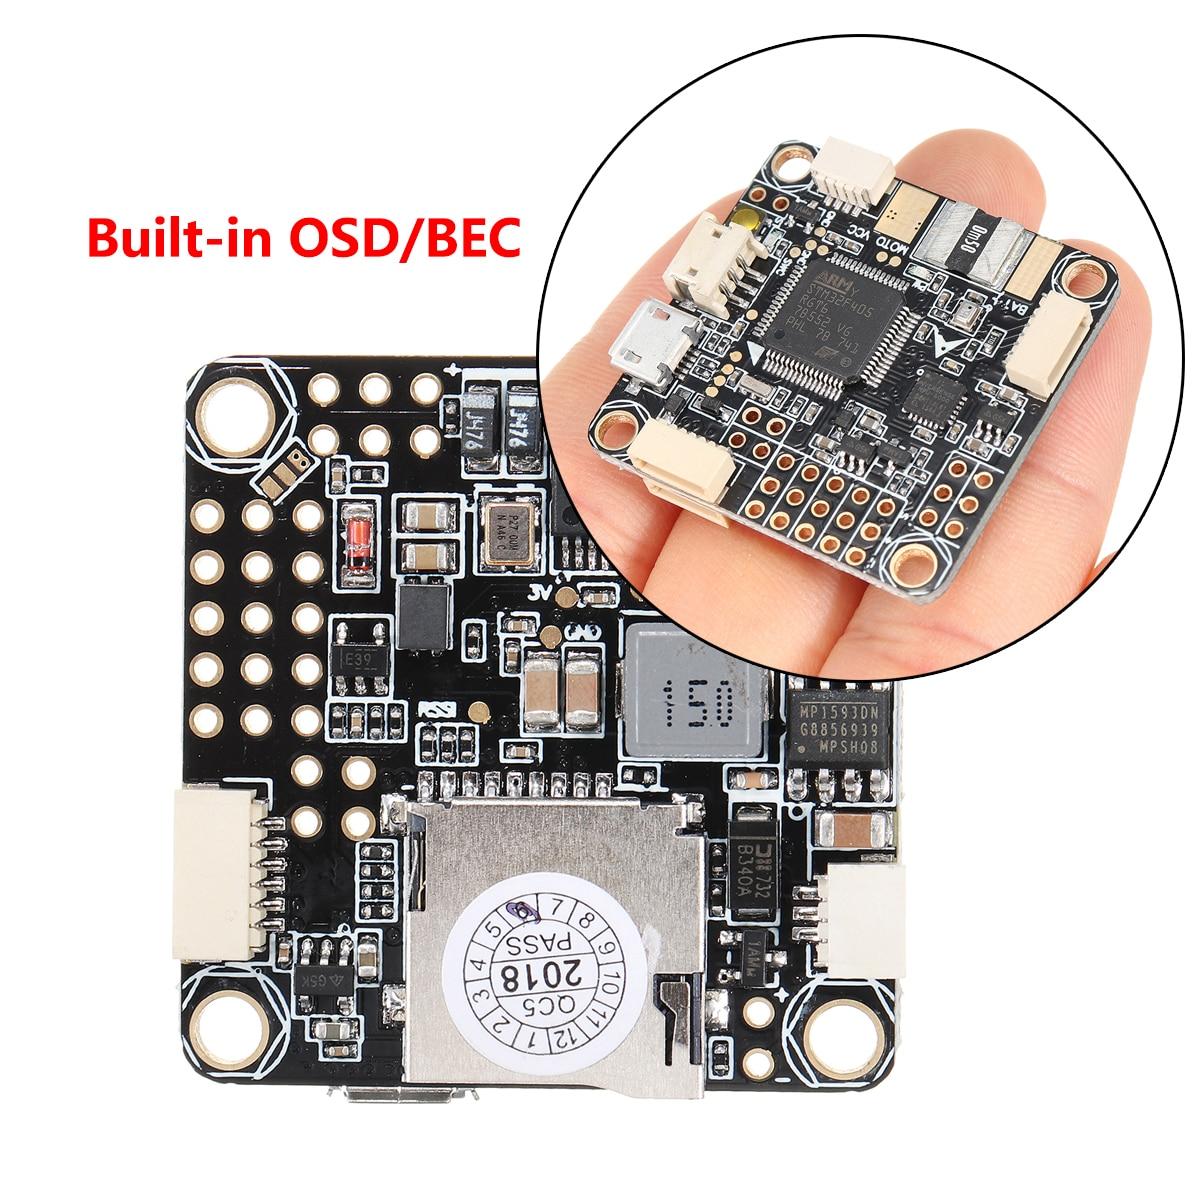 Für Betaflight F4 PRO V2 Flug Controller Integrierte OSD/BEC Drone Geräuscharm Stabile für FPV Racing Verbesserte Neueste